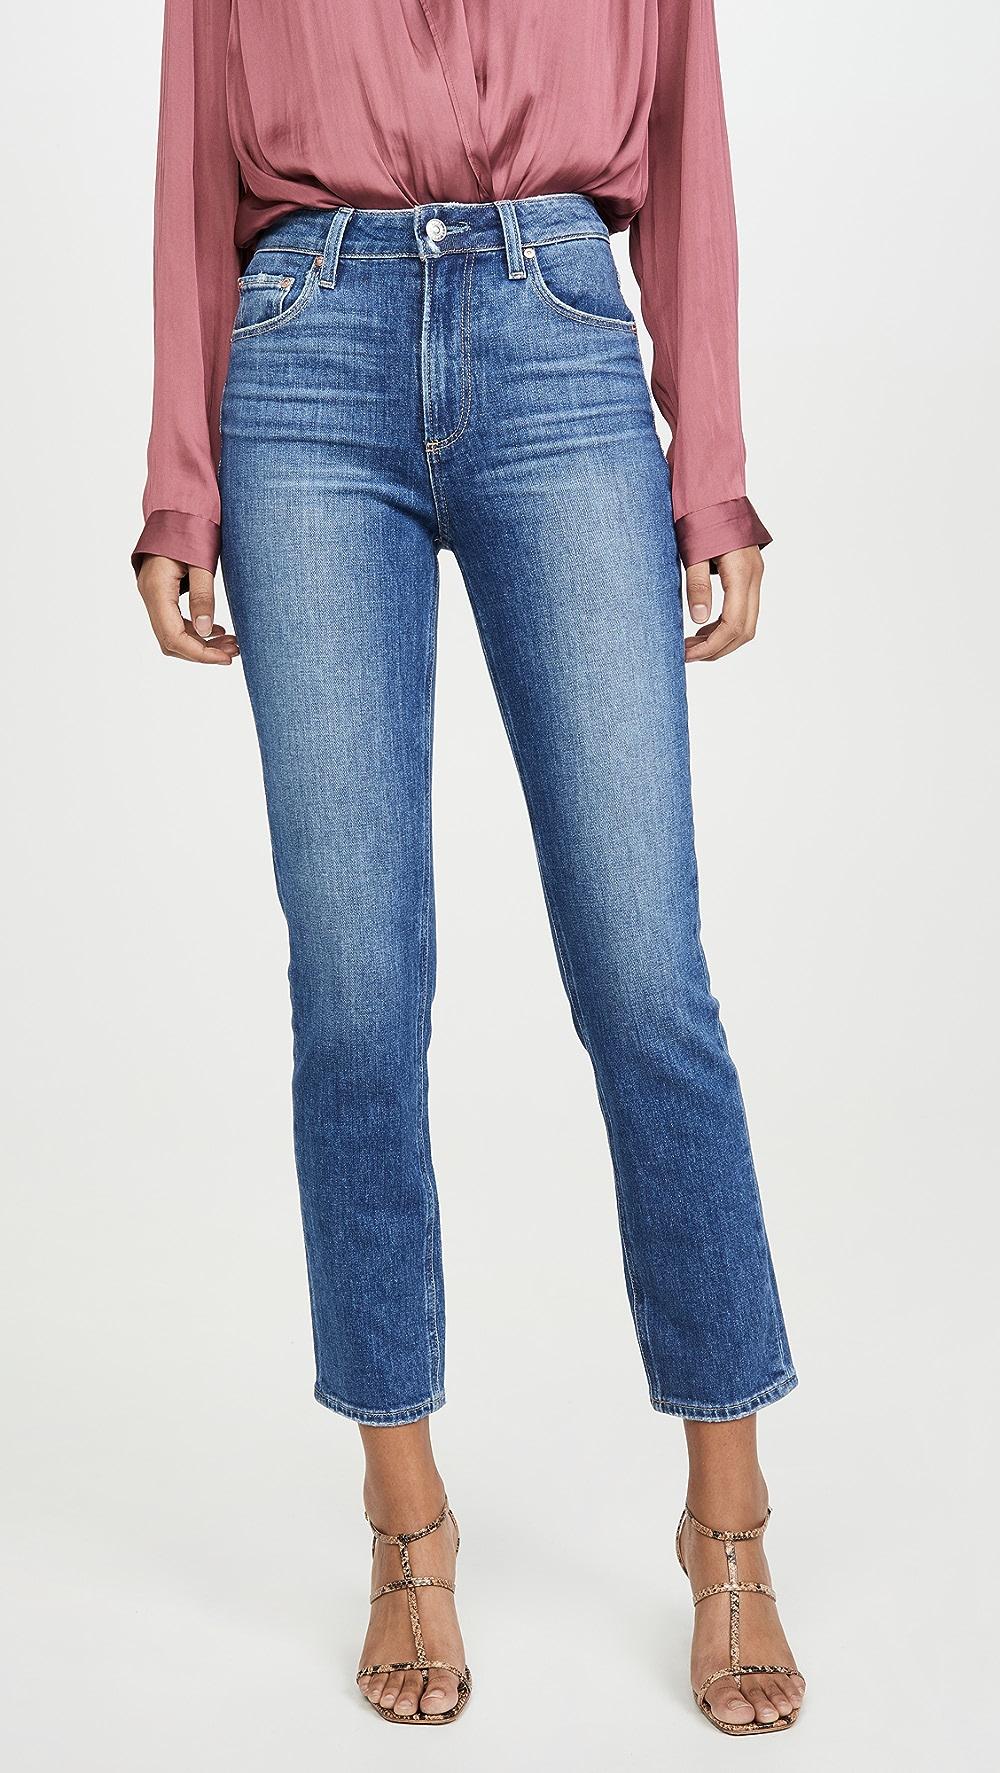 Fine Paige - Sarah Slim Jeans Moderate Cost